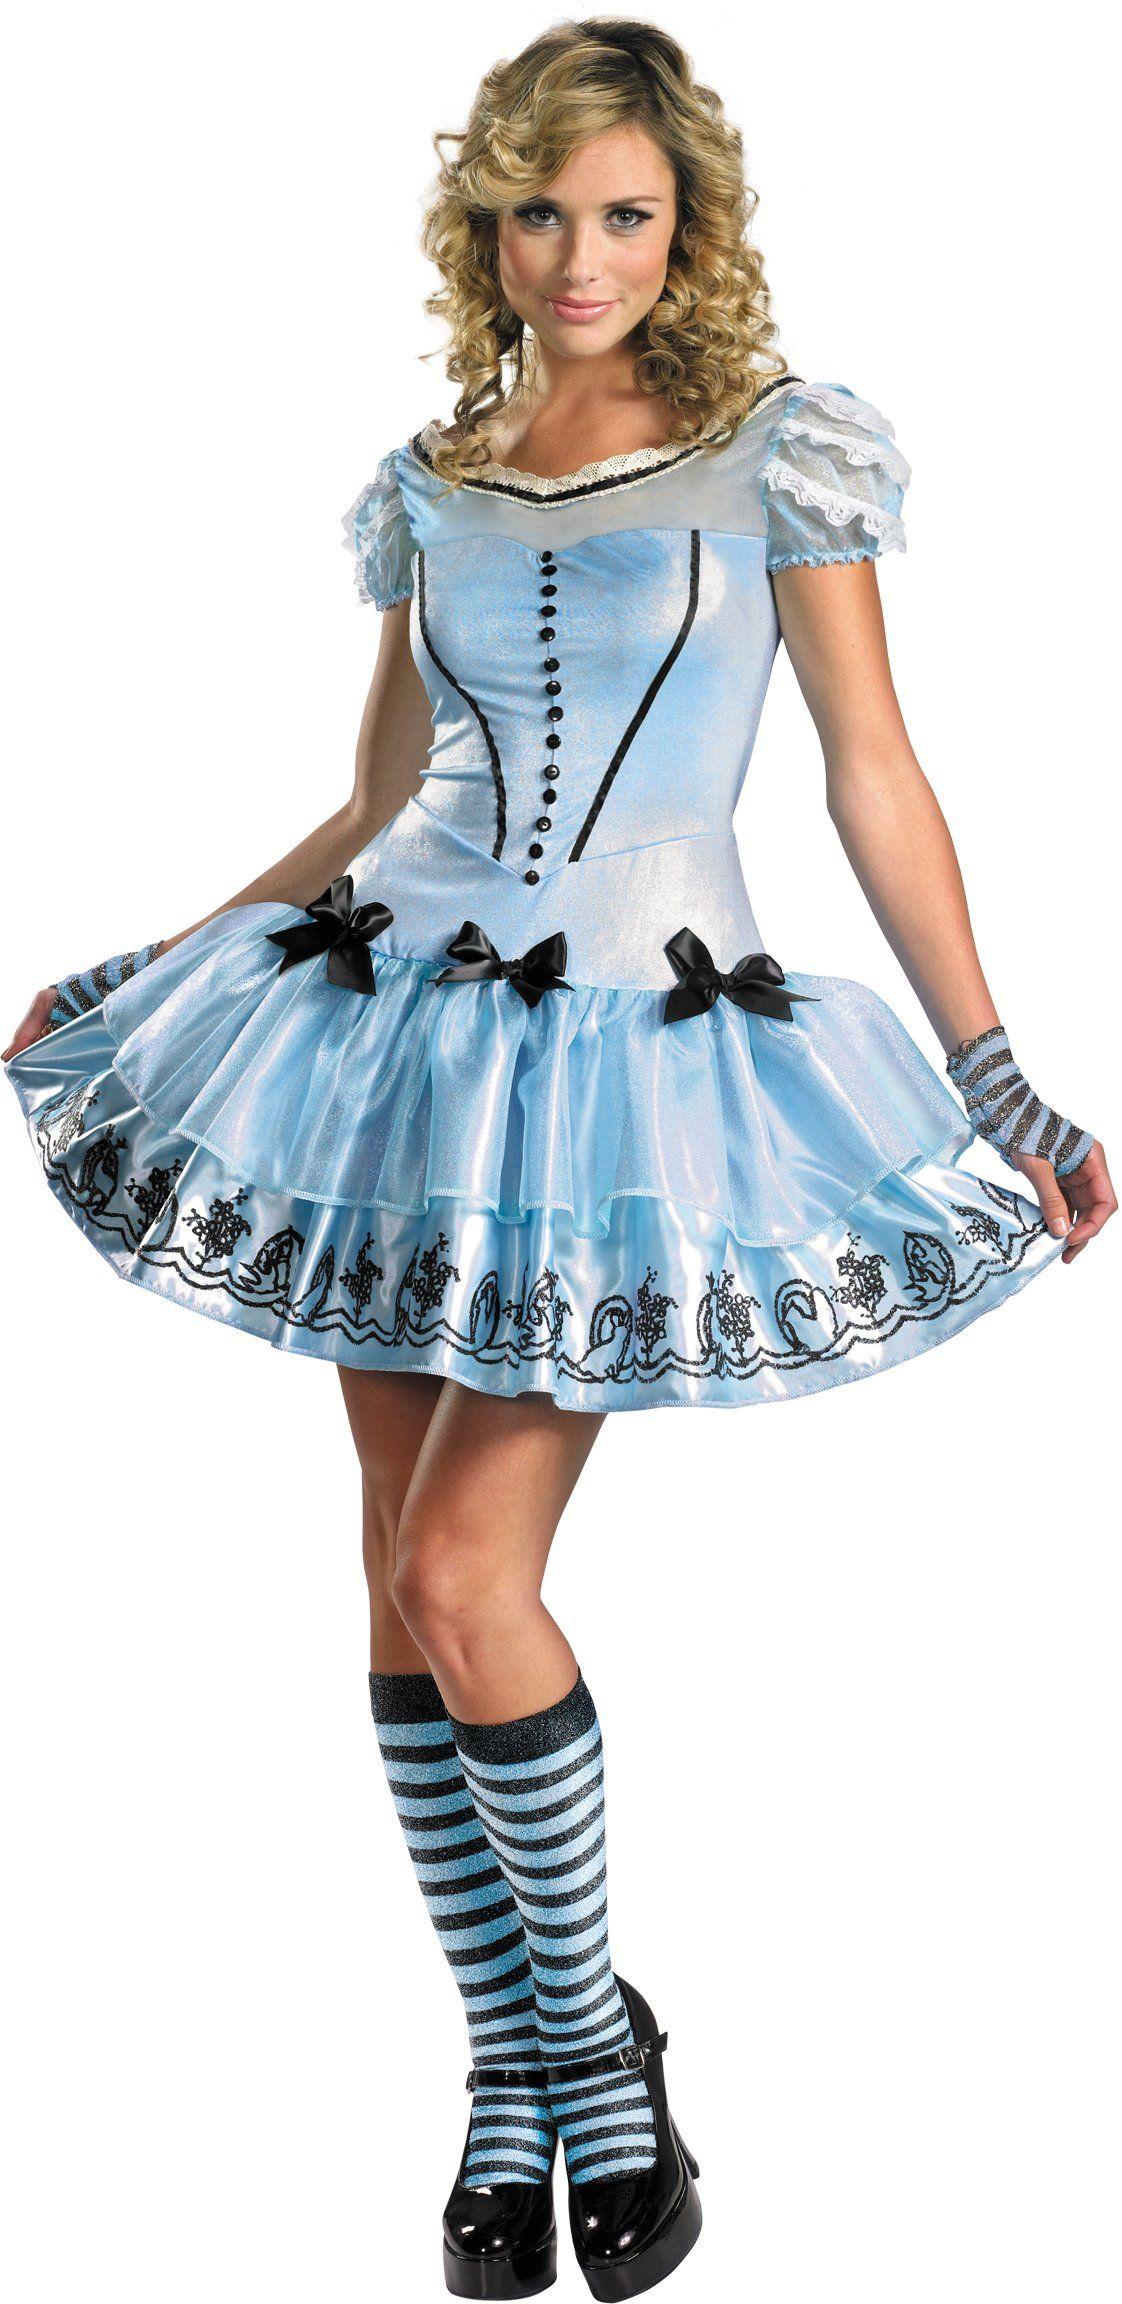 Alice In Wonderland Movie - Sassy Blue Dress Alice Adult Costume ...